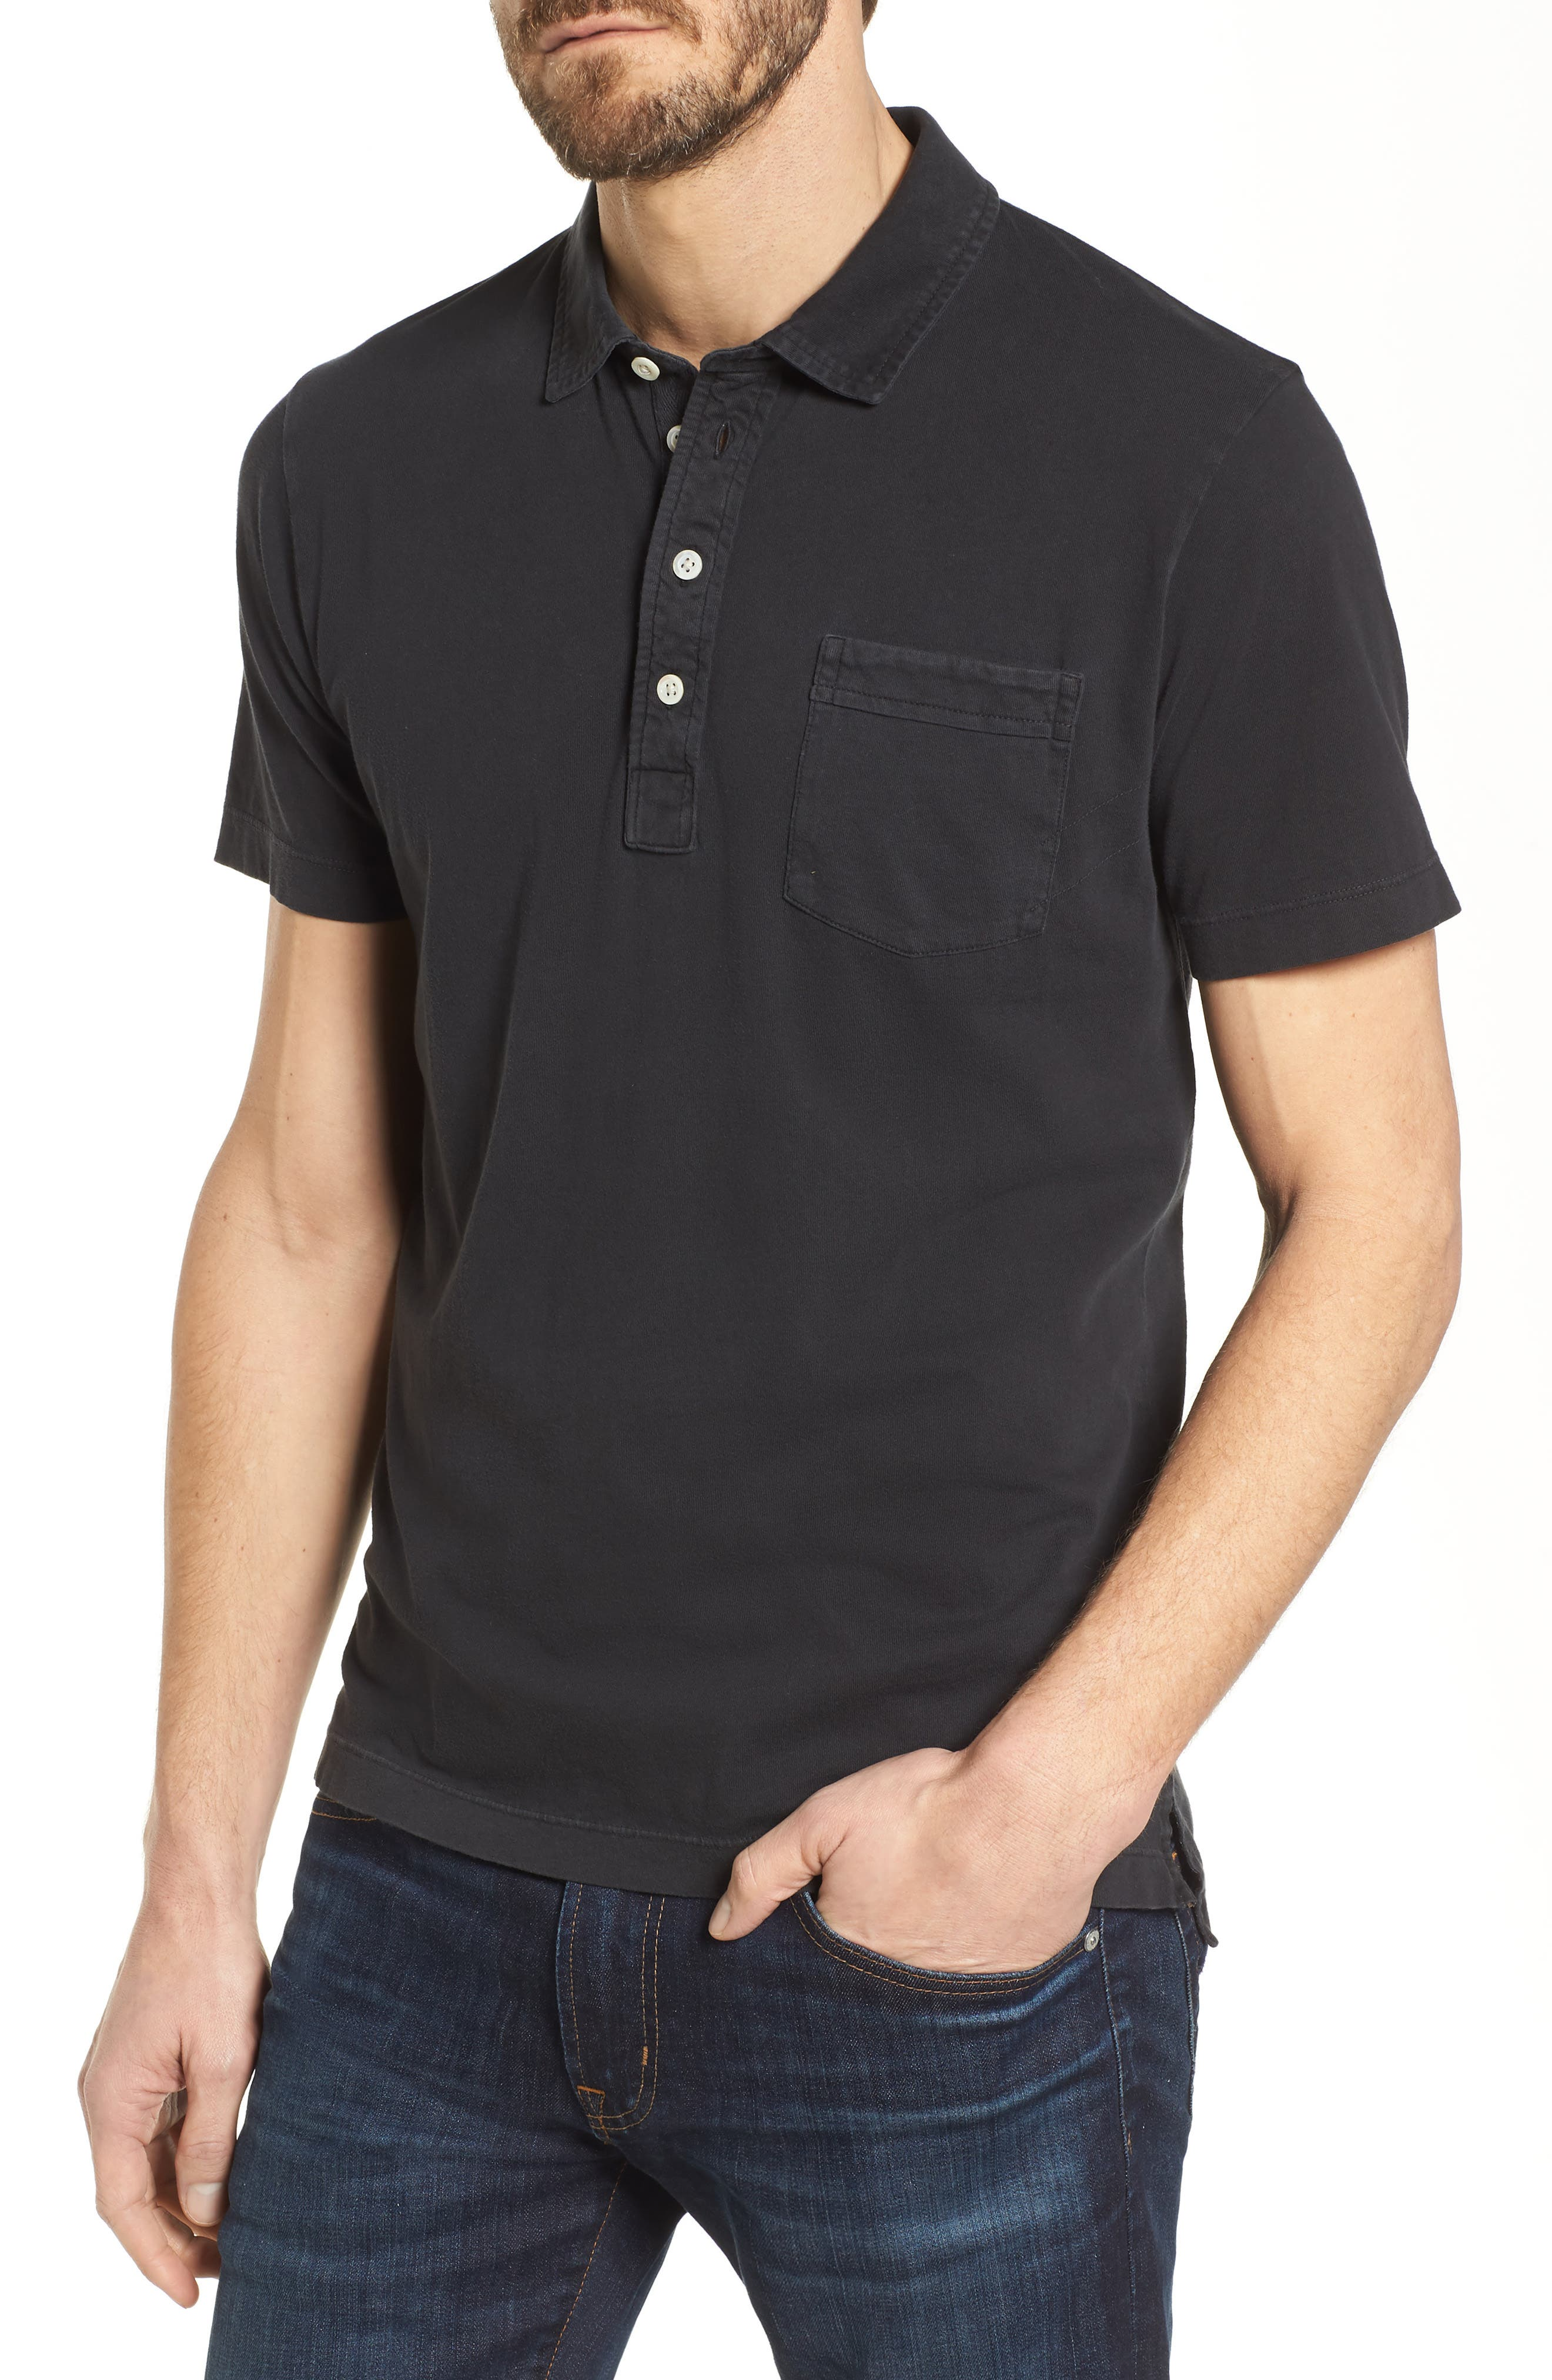 Pensacola GD Slim Fit Polo,                             Main thumbnail 1, color,                             Black